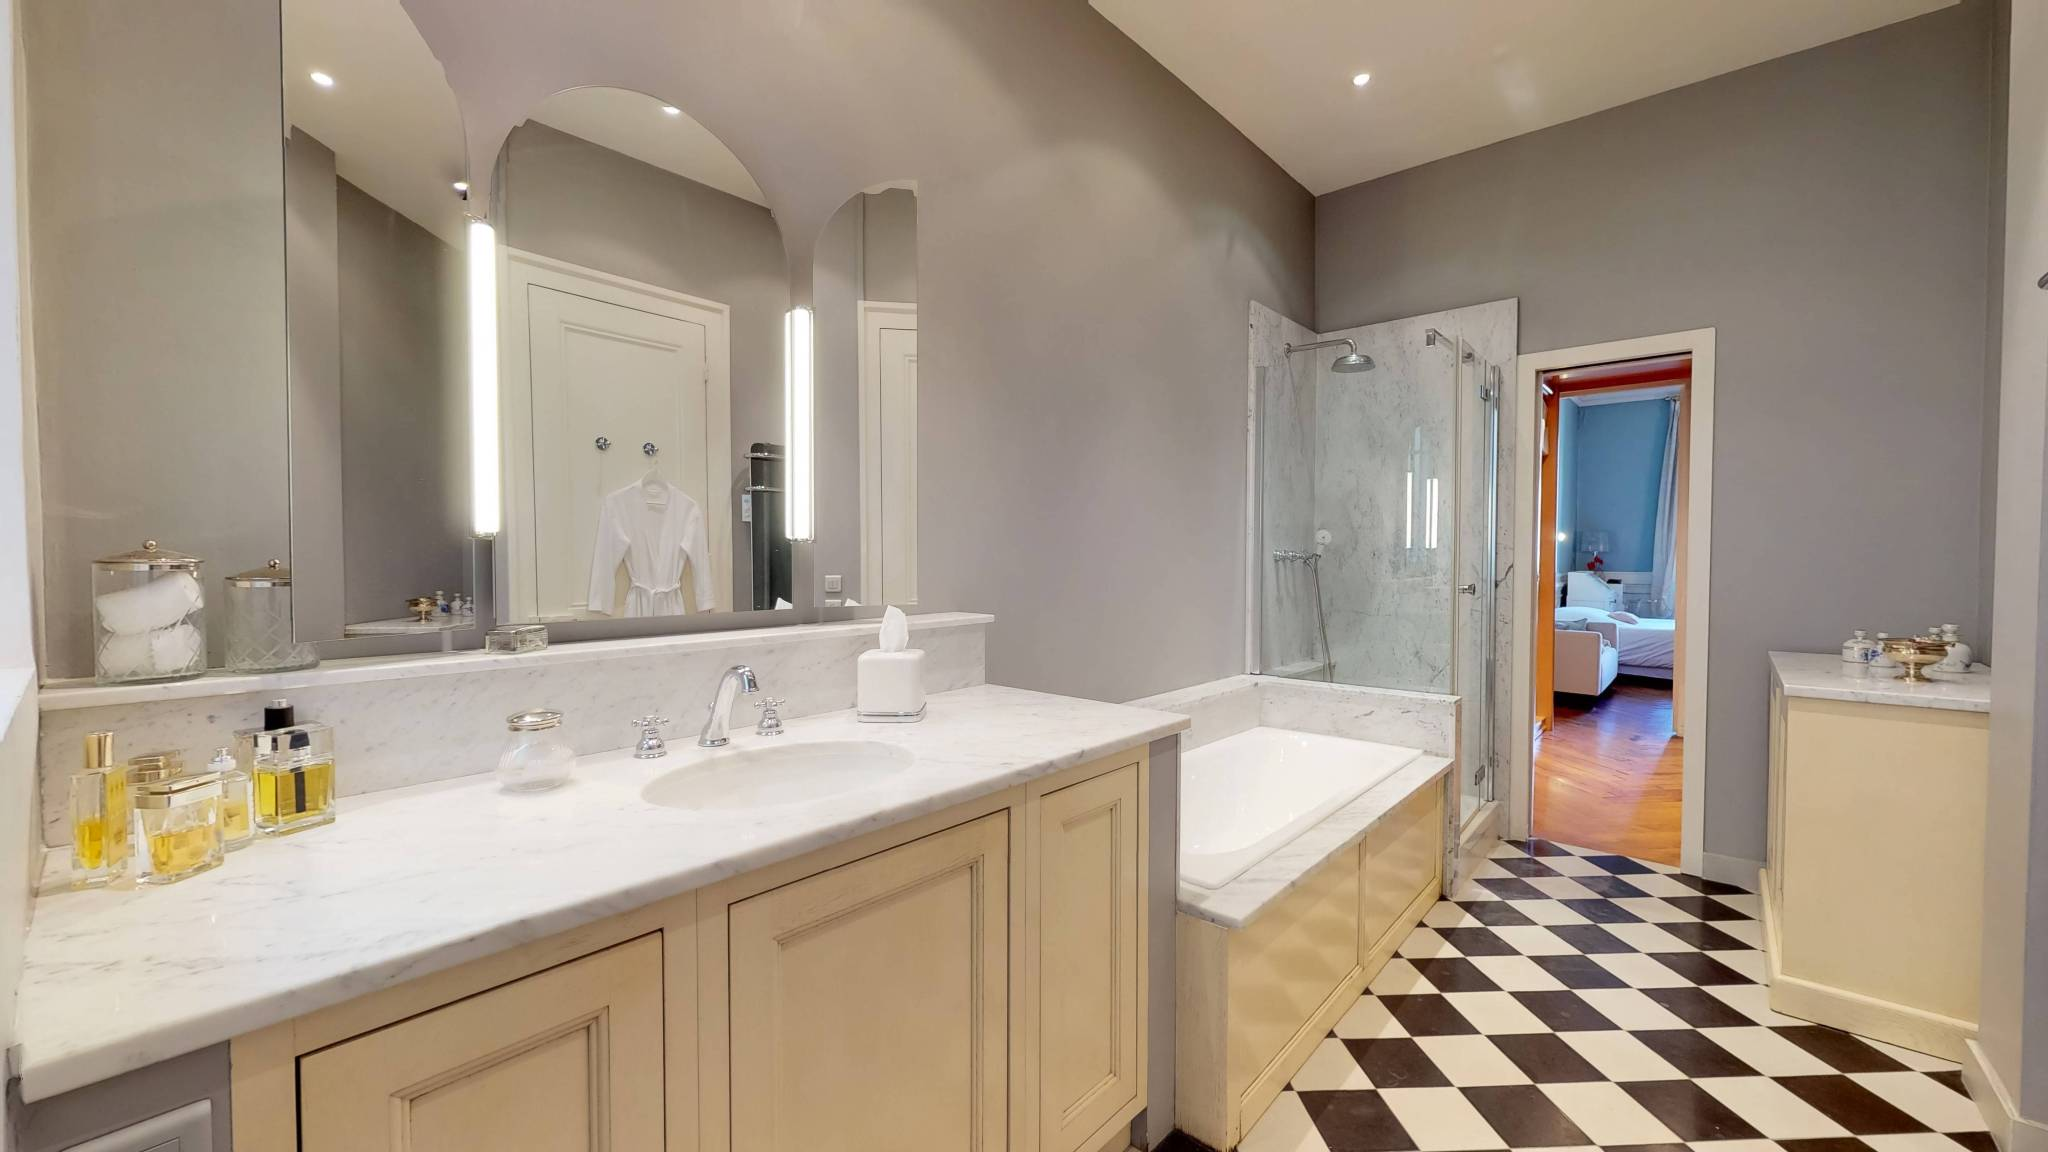 LYON-3e-PREFECTURE-GRAND-APPARTEMENT-Salle-de-bains (2)